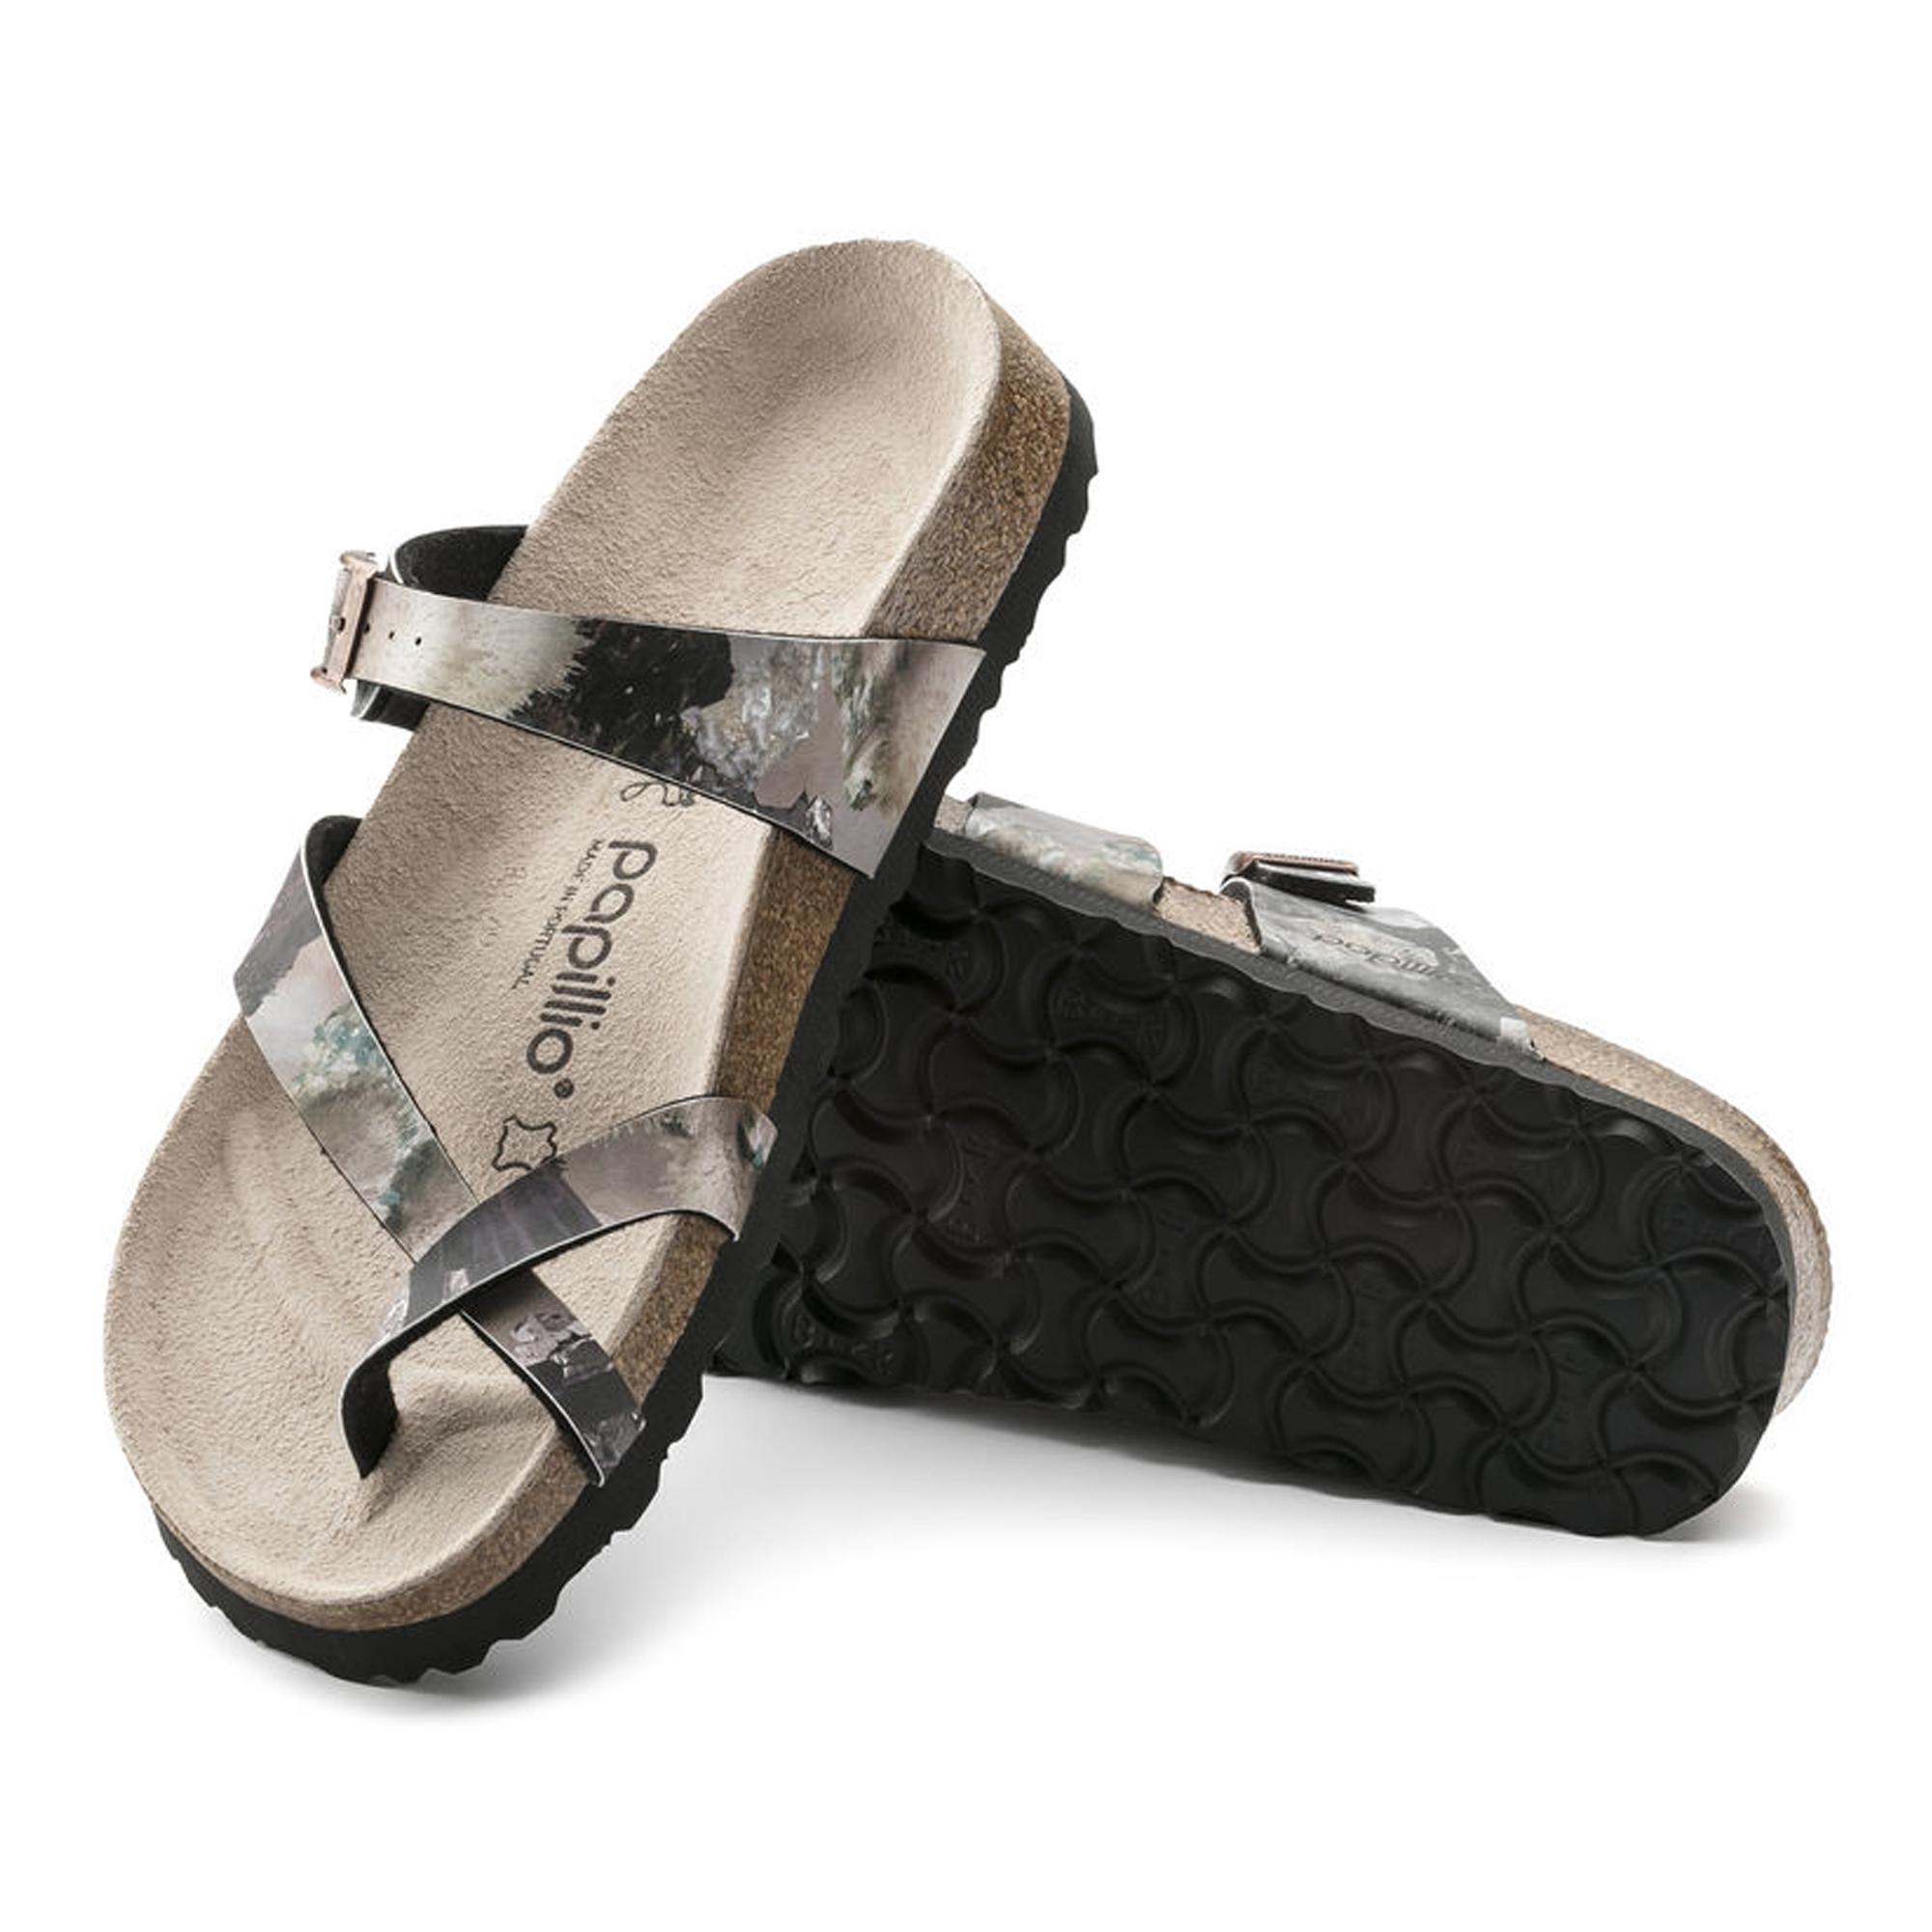 8e7b99be4ac9 Papillio TABORA 1009078 Ladies Cross Strap Sandals Crystal Lilac ...